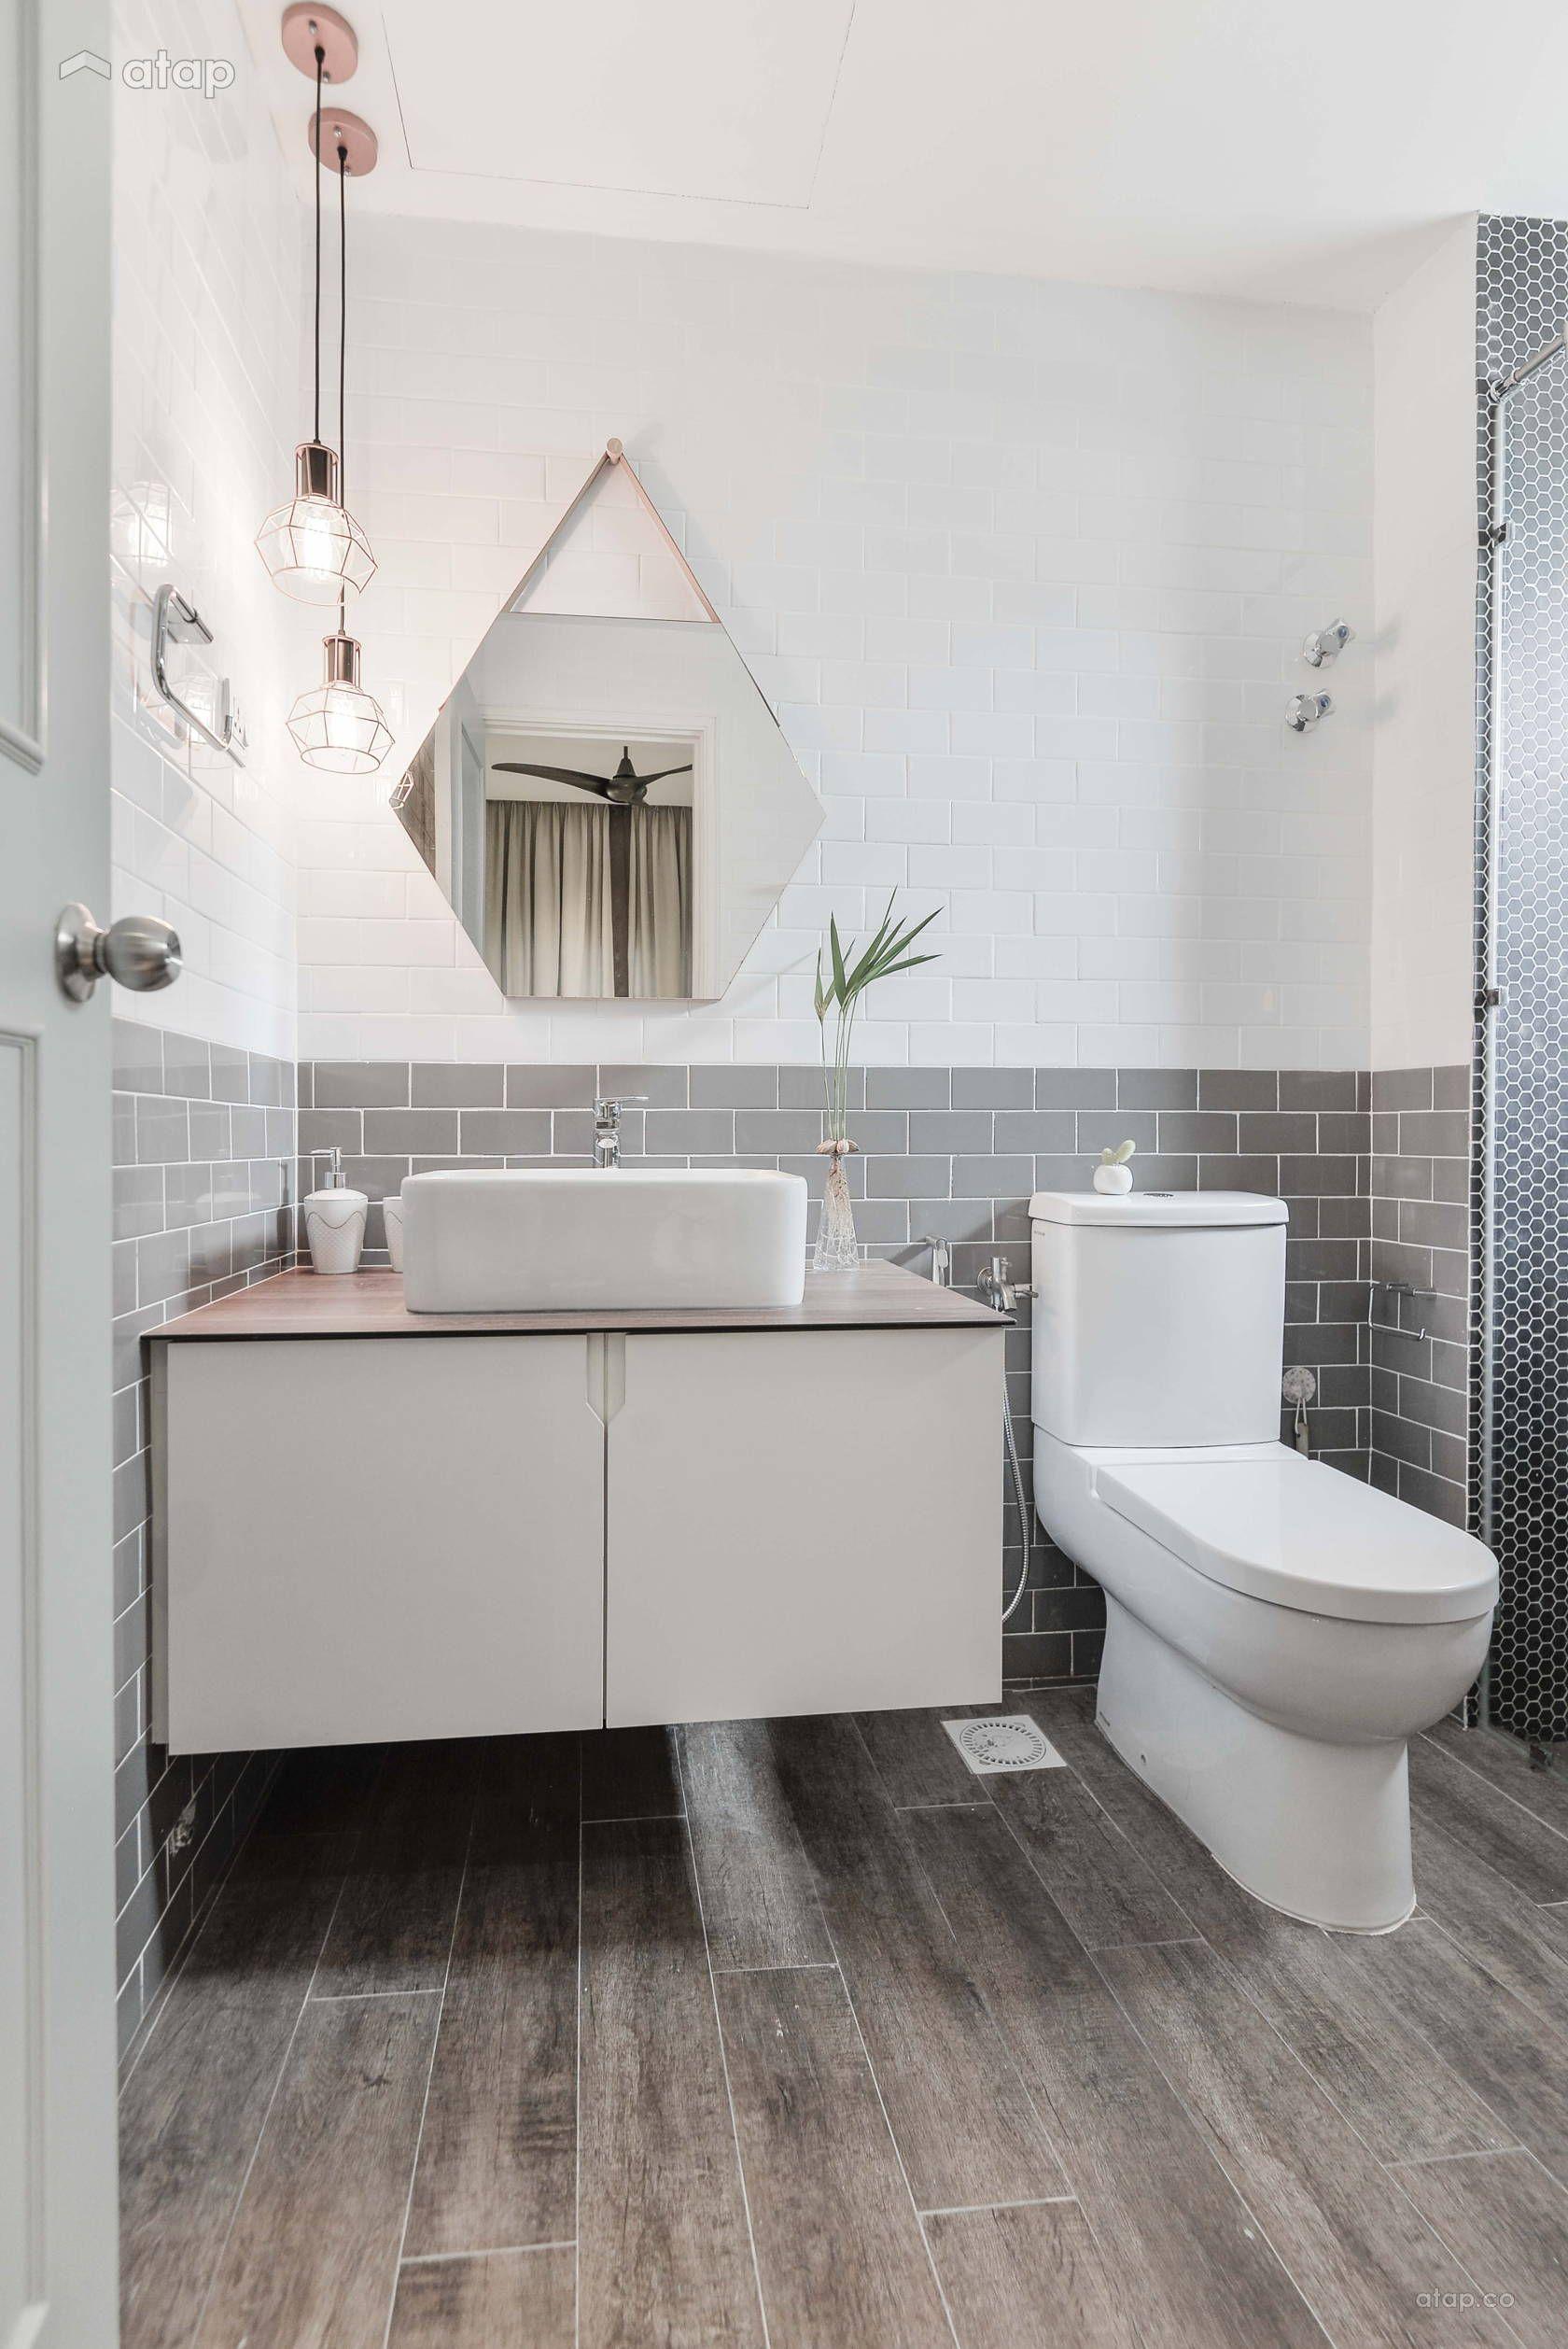 Minimalistic Modern Bathroom Condominium Design Ideas Photos Malaysia Atap Co Small Bathroom Tiles Elegant Bathroom Modern Bathroom